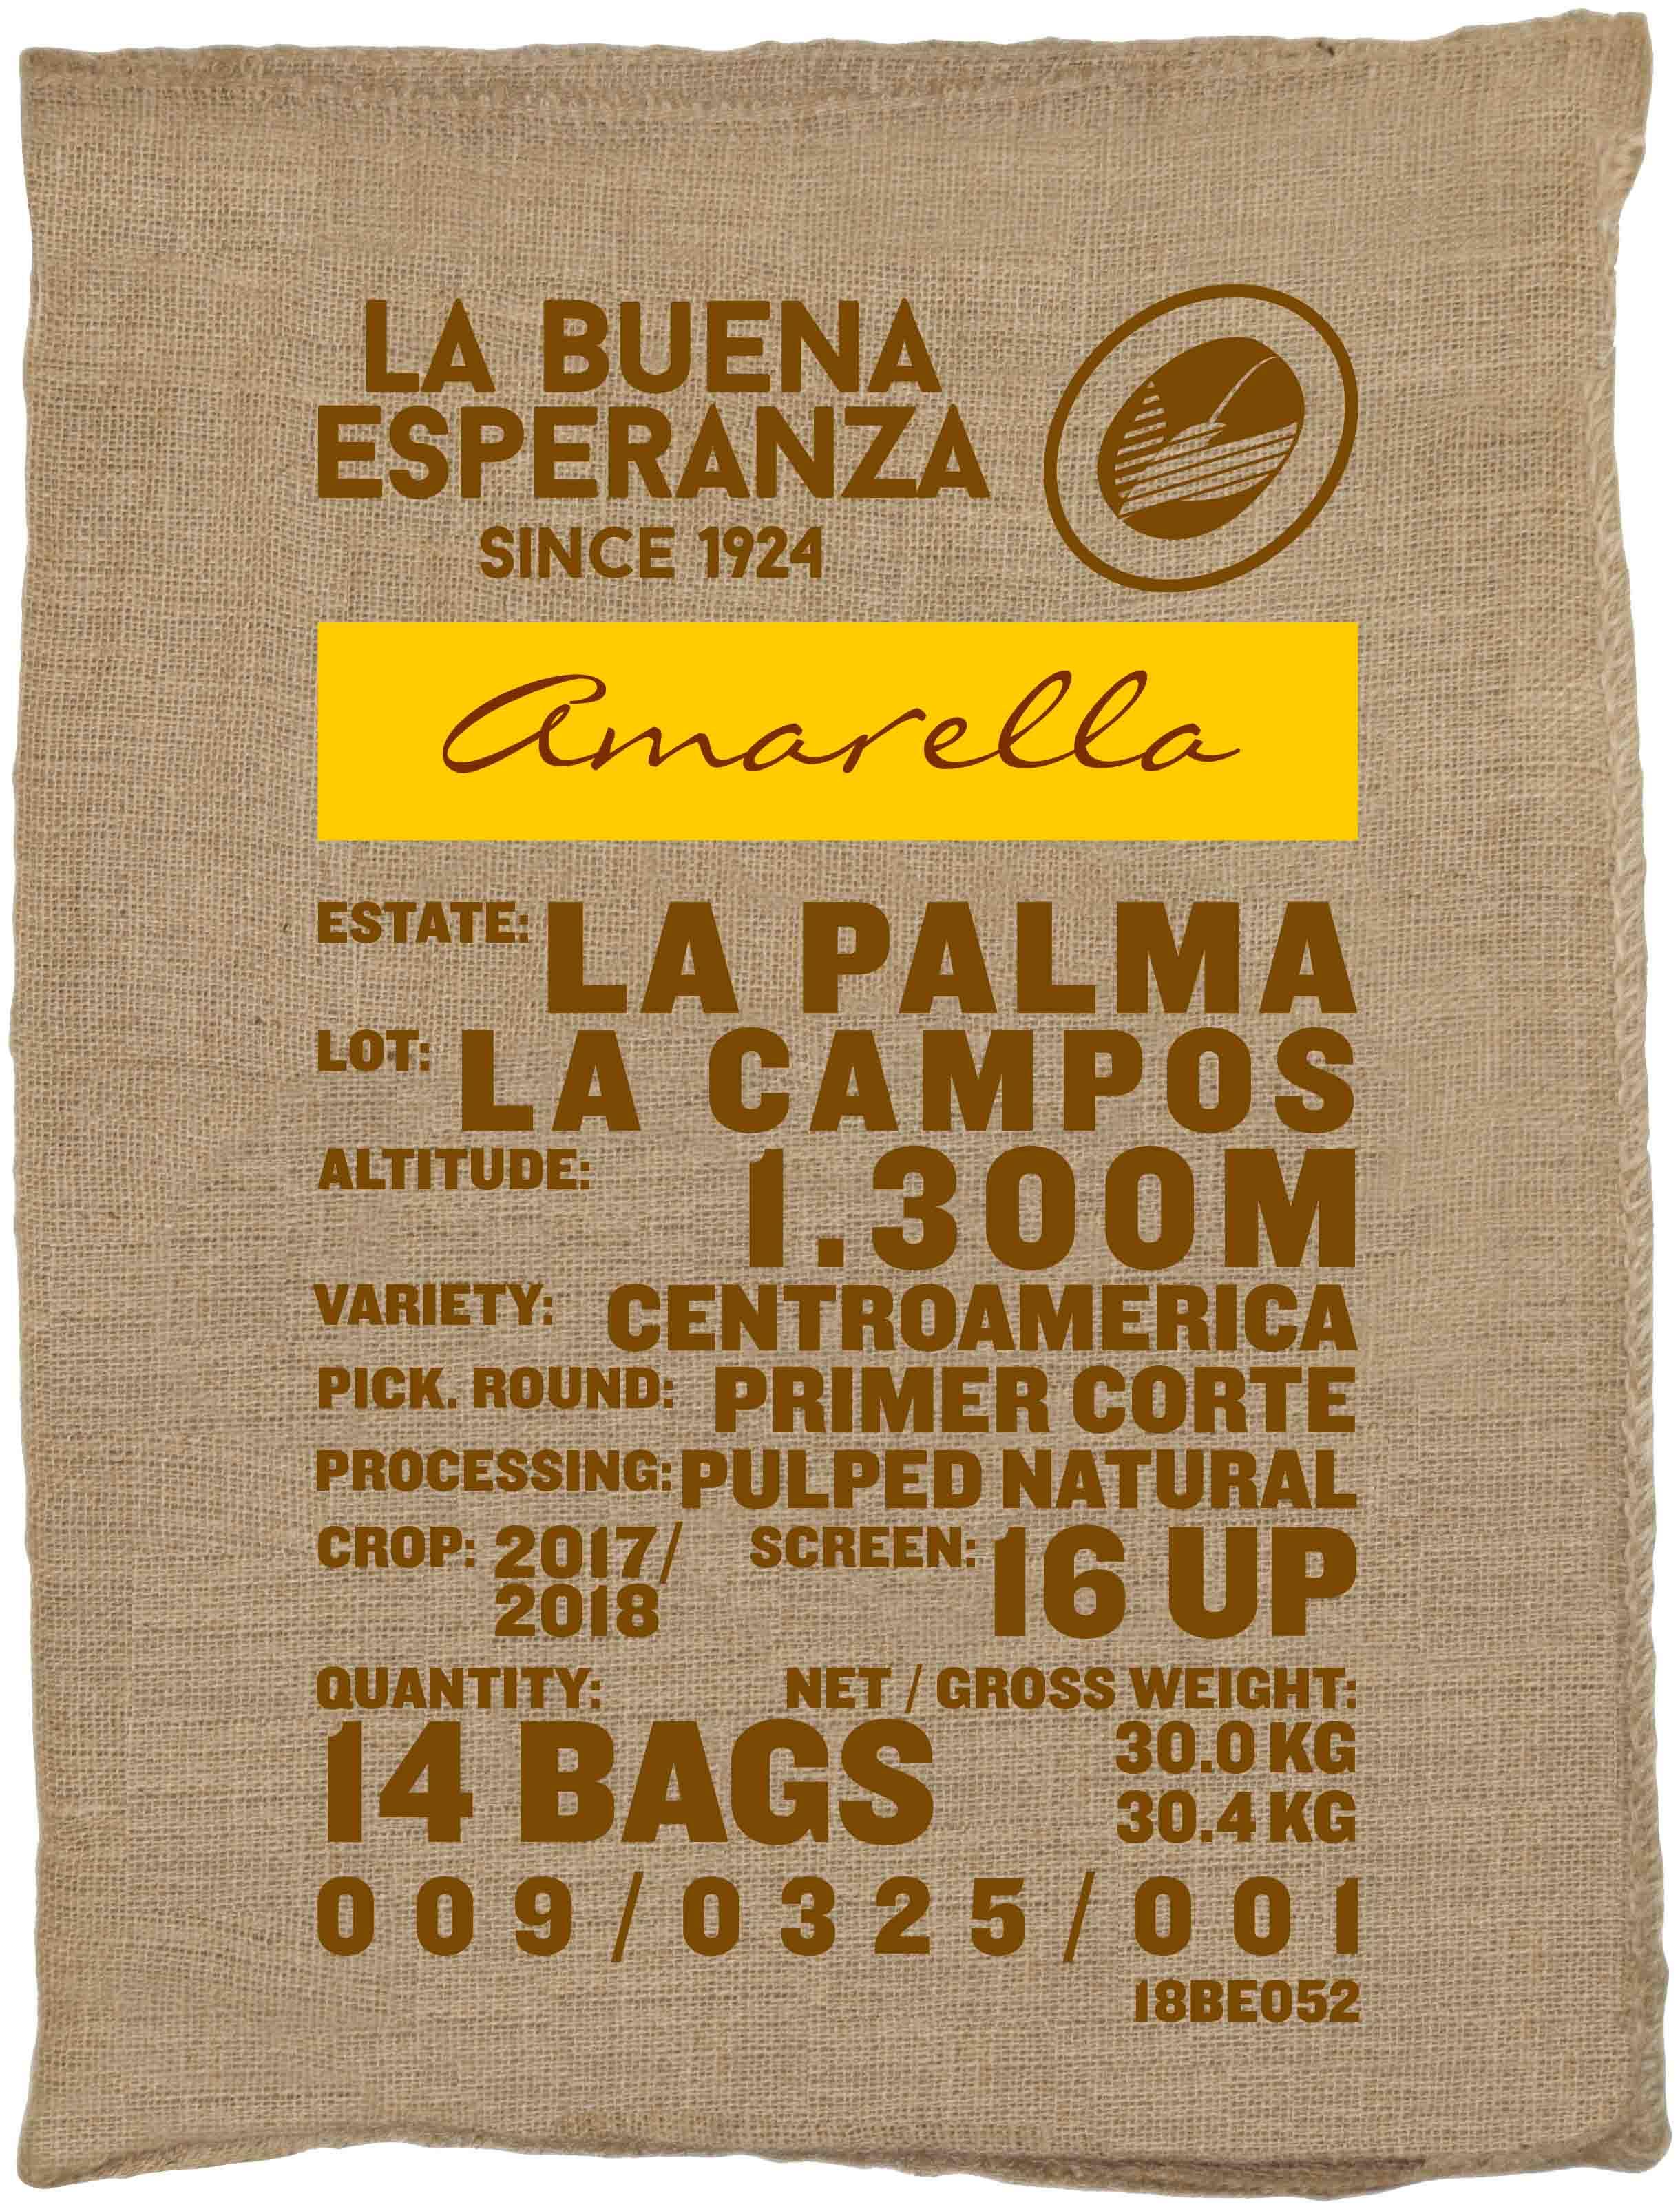 Ein Rohkaffeesack amarella Parzellenkaffee Varietät Centroamerica. Finca La Buena Esperanza Lot La Campos.